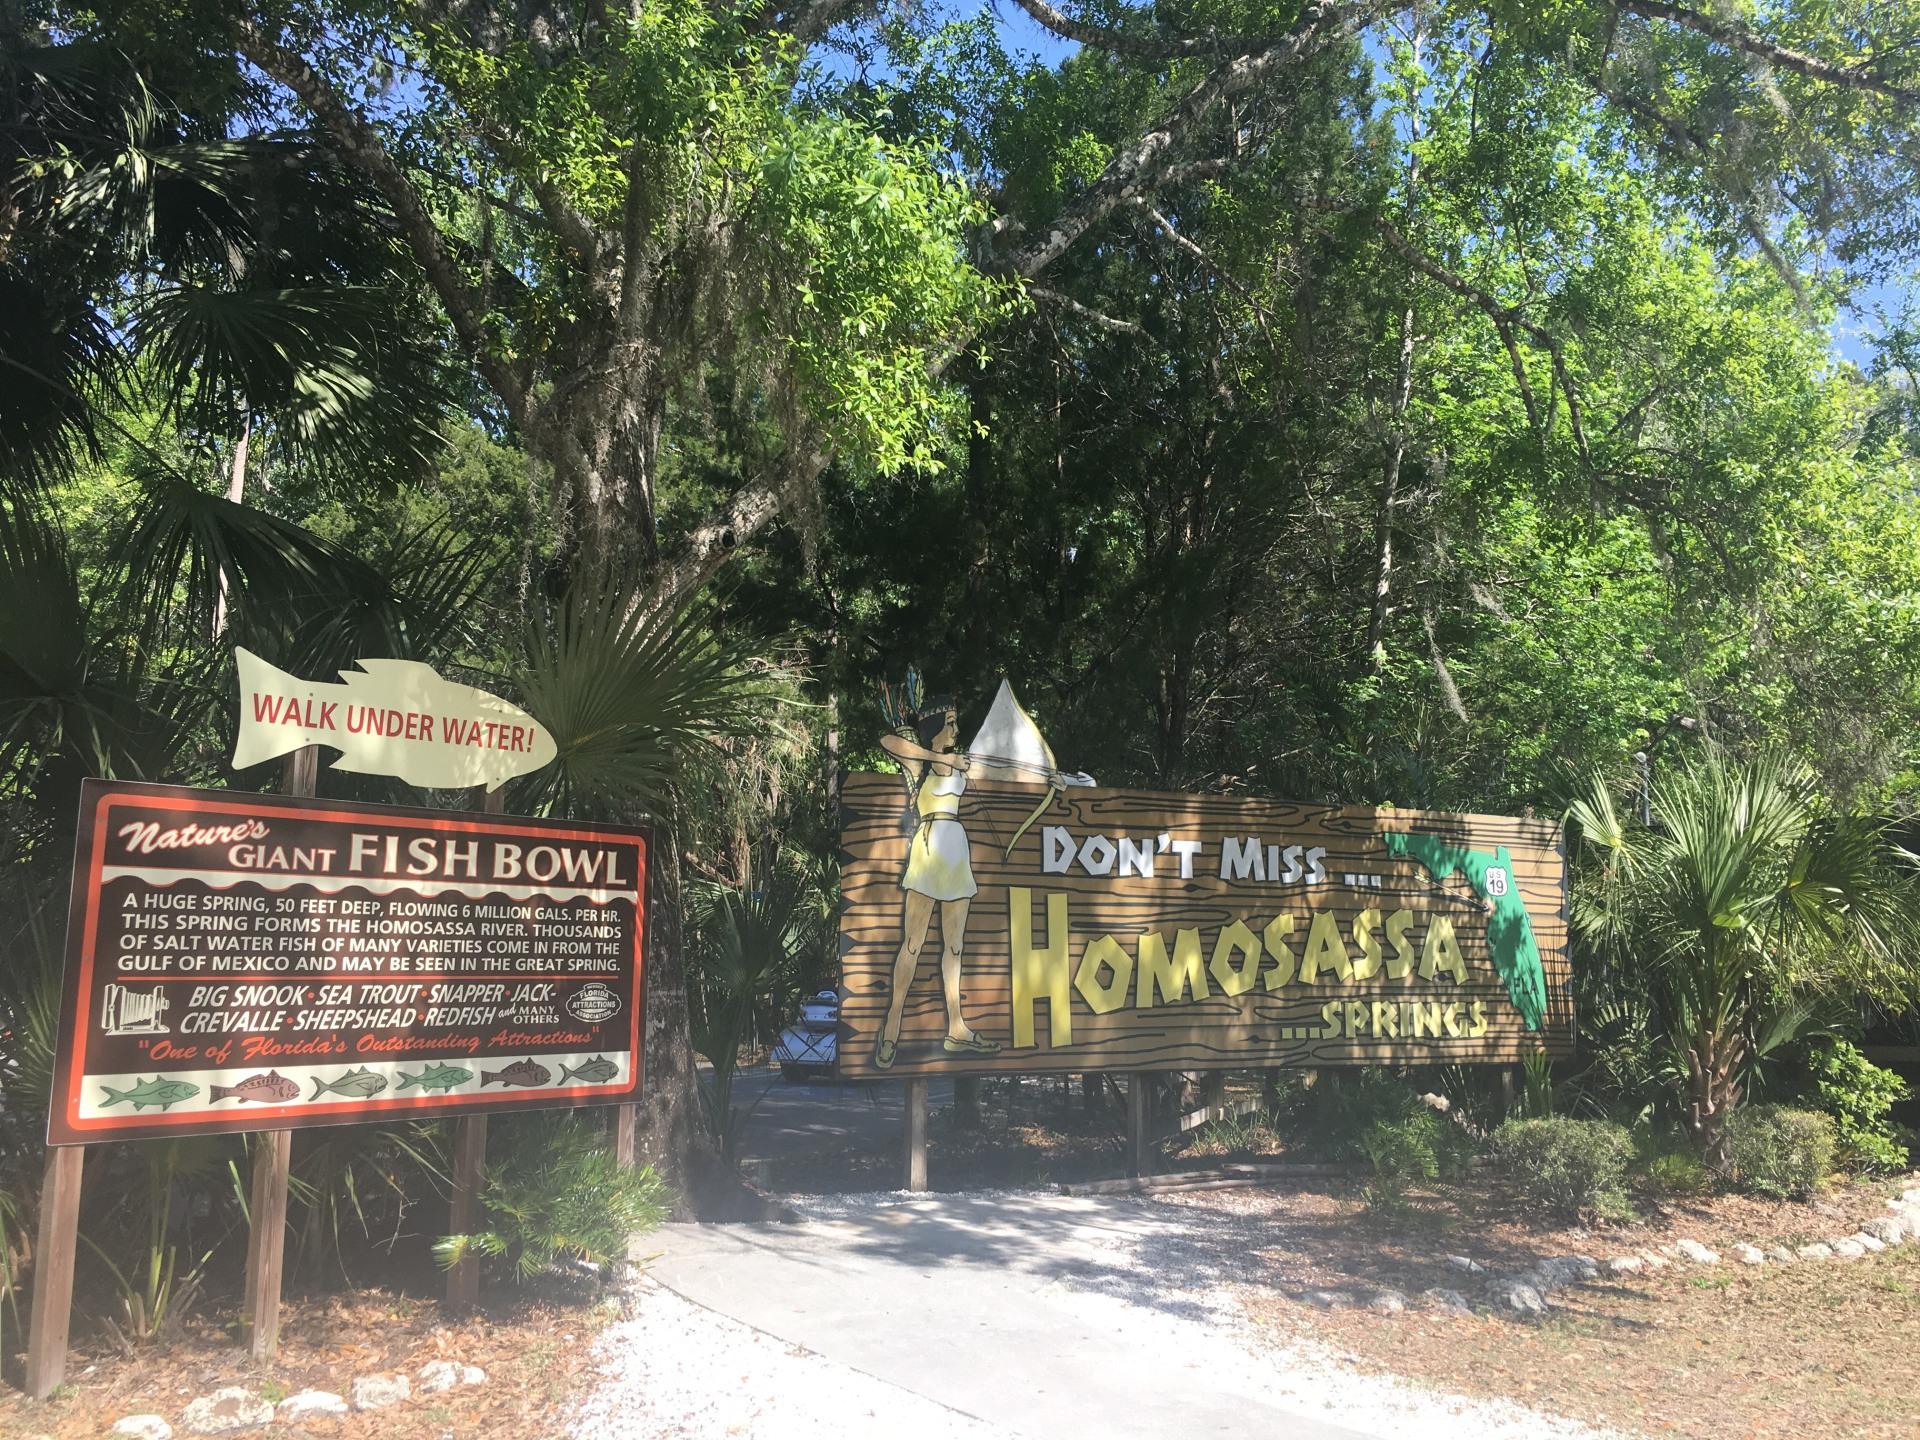 Tour of Homosassa Springs Wildlife State Park, Florida!!!!